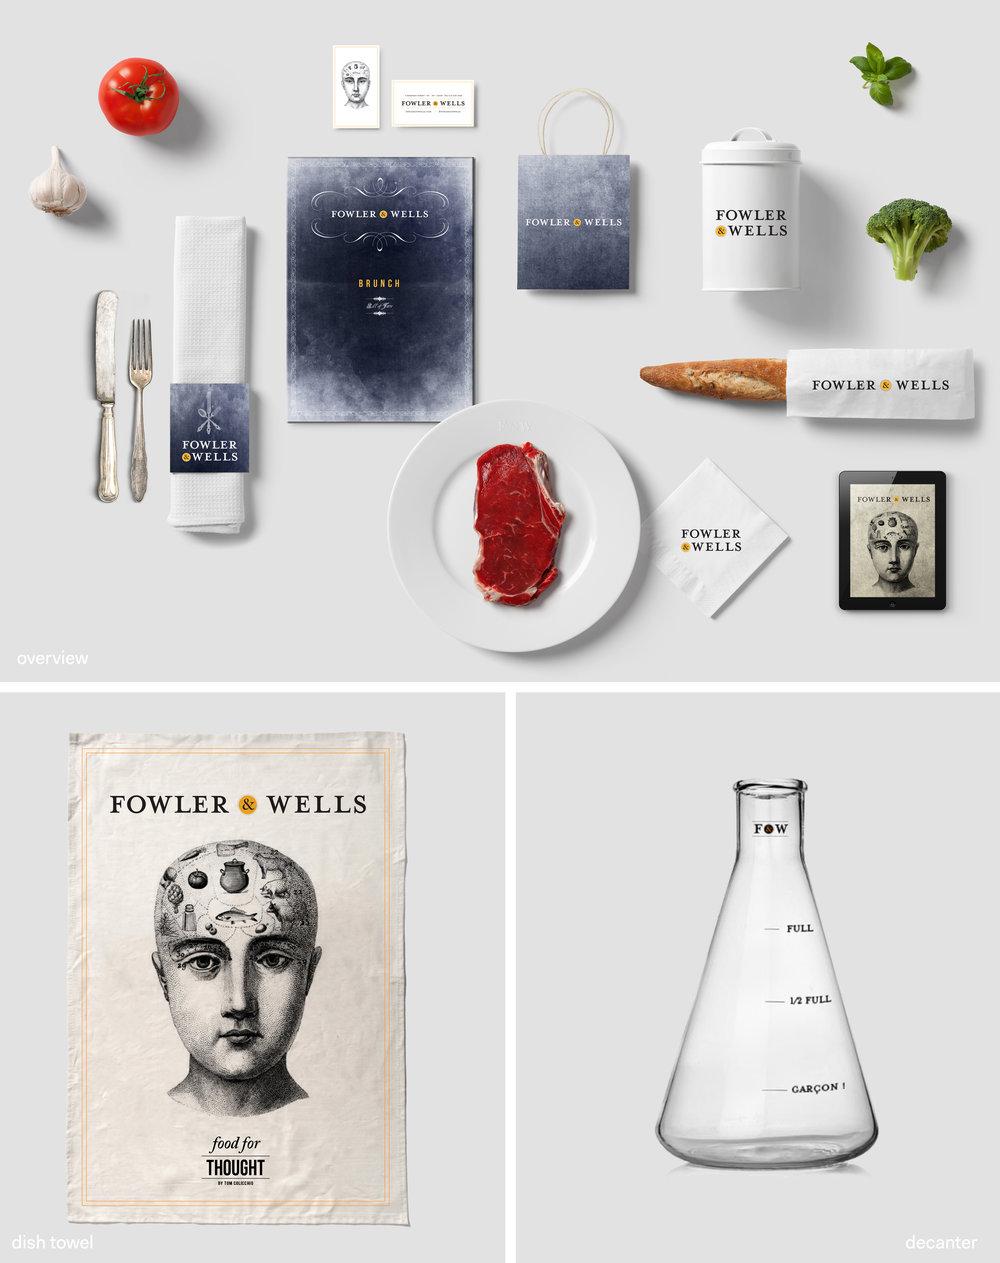 fowler and wells branding design